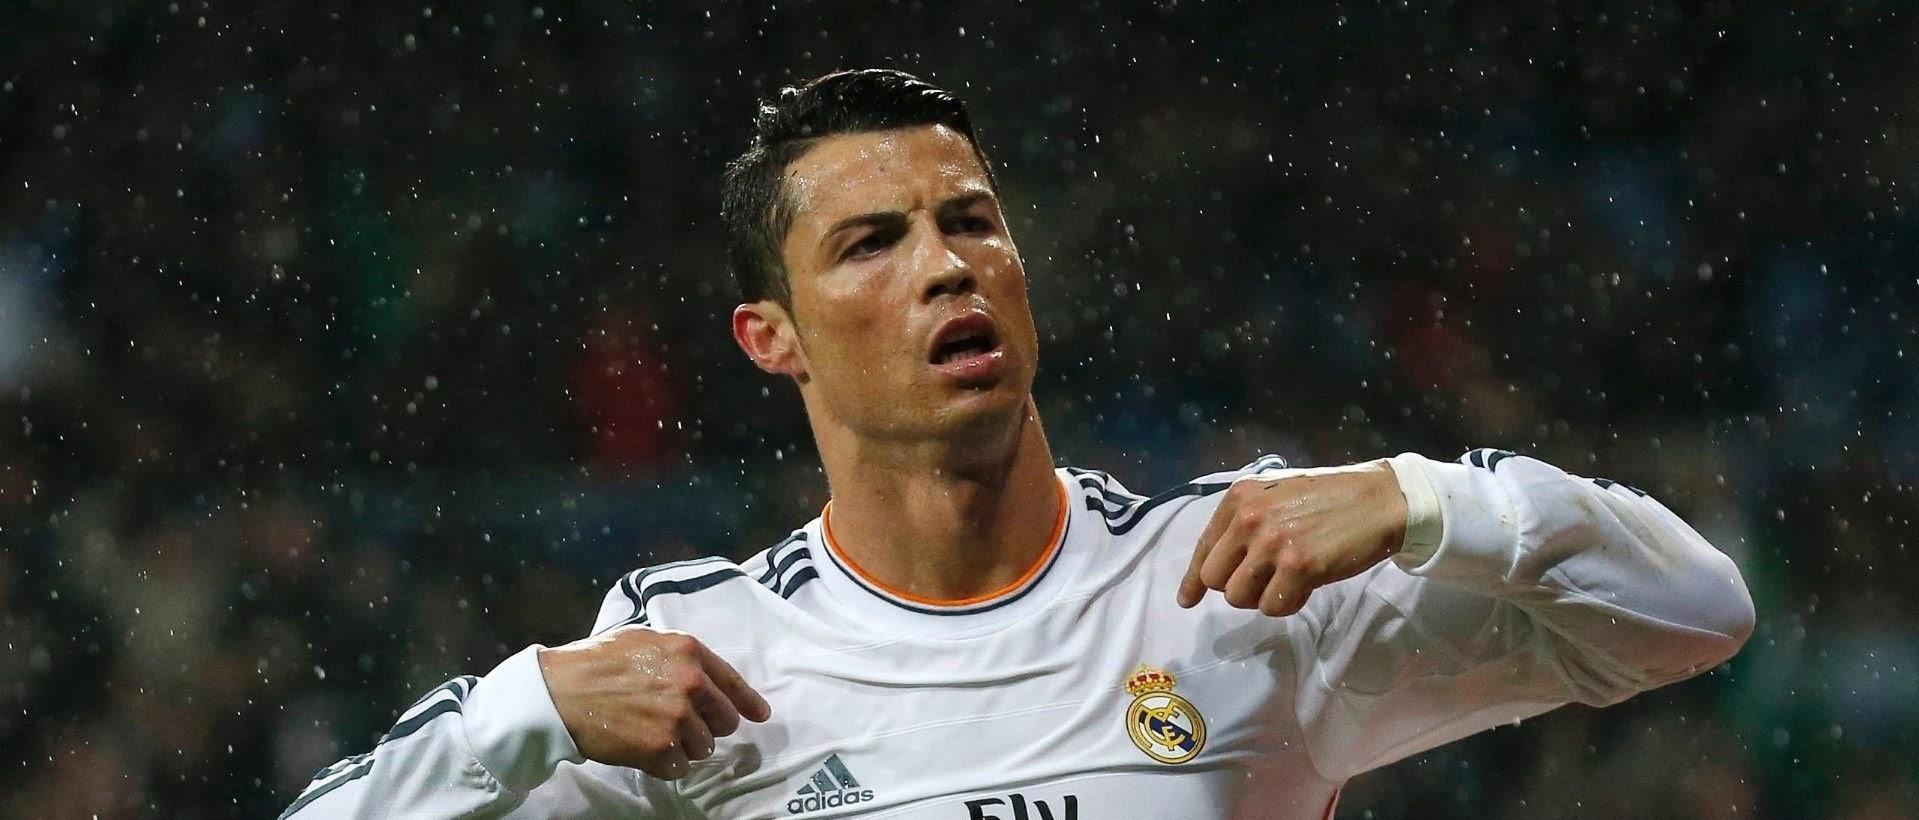 Cristiano Ronaldo. Imaginea din spatele arogantei